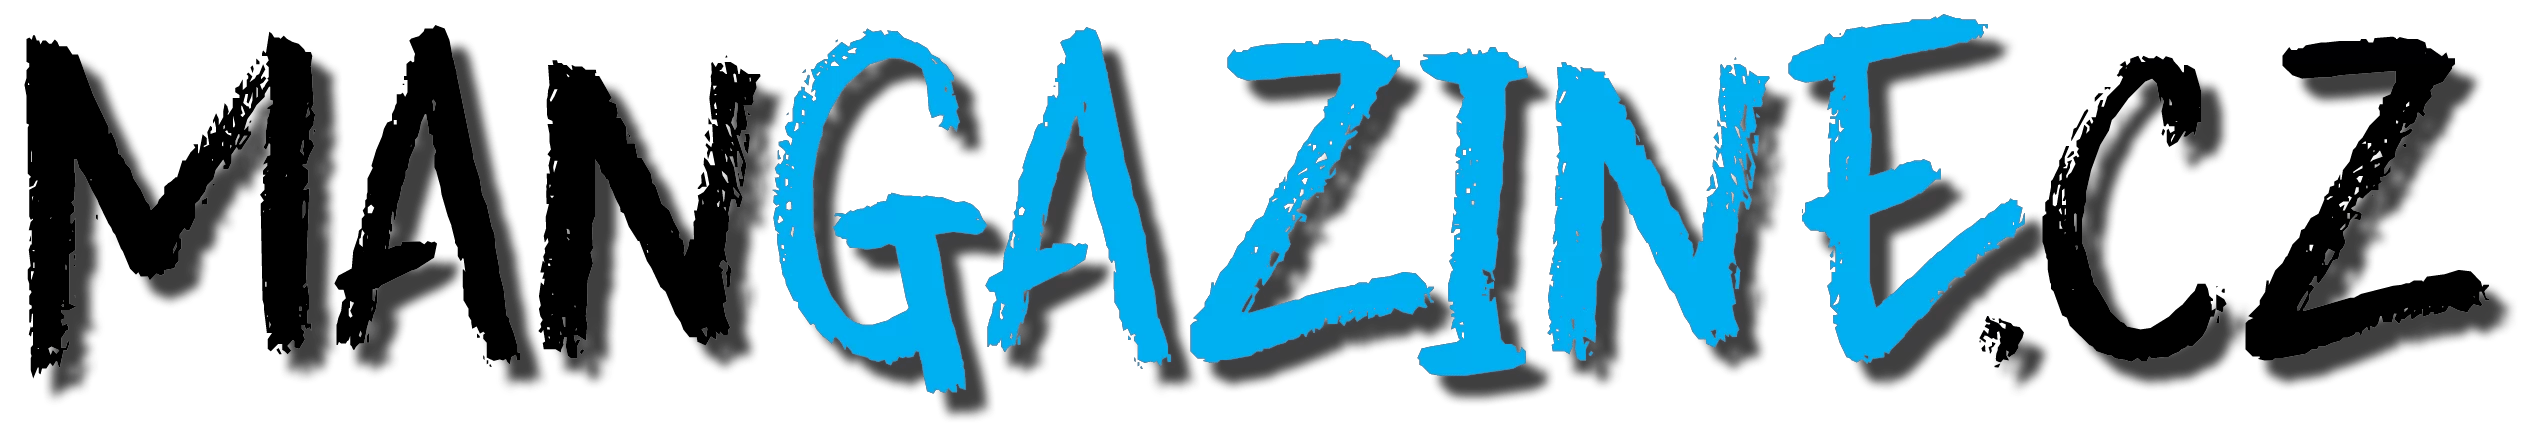 mangazine-logo-modra